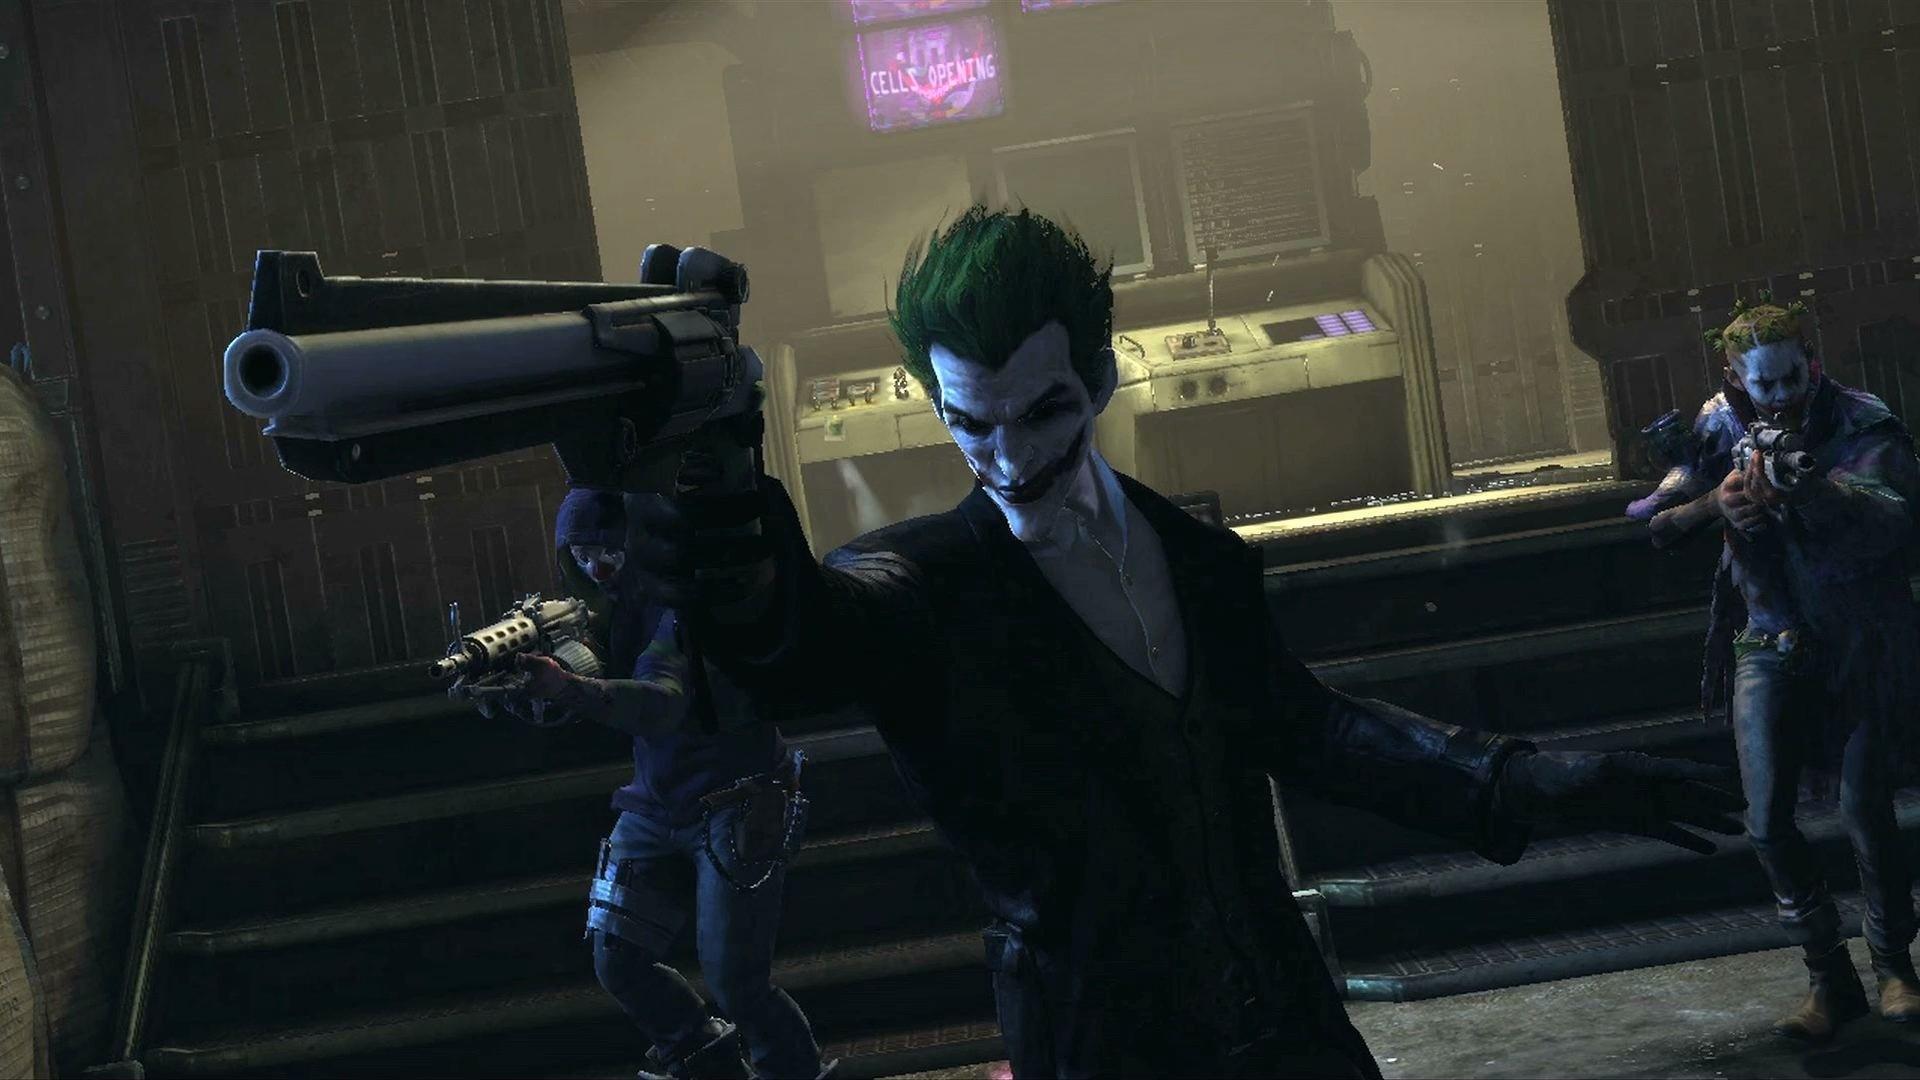 Batman arkham origins multiplayer beta keys being sent out voltagebd Image collections